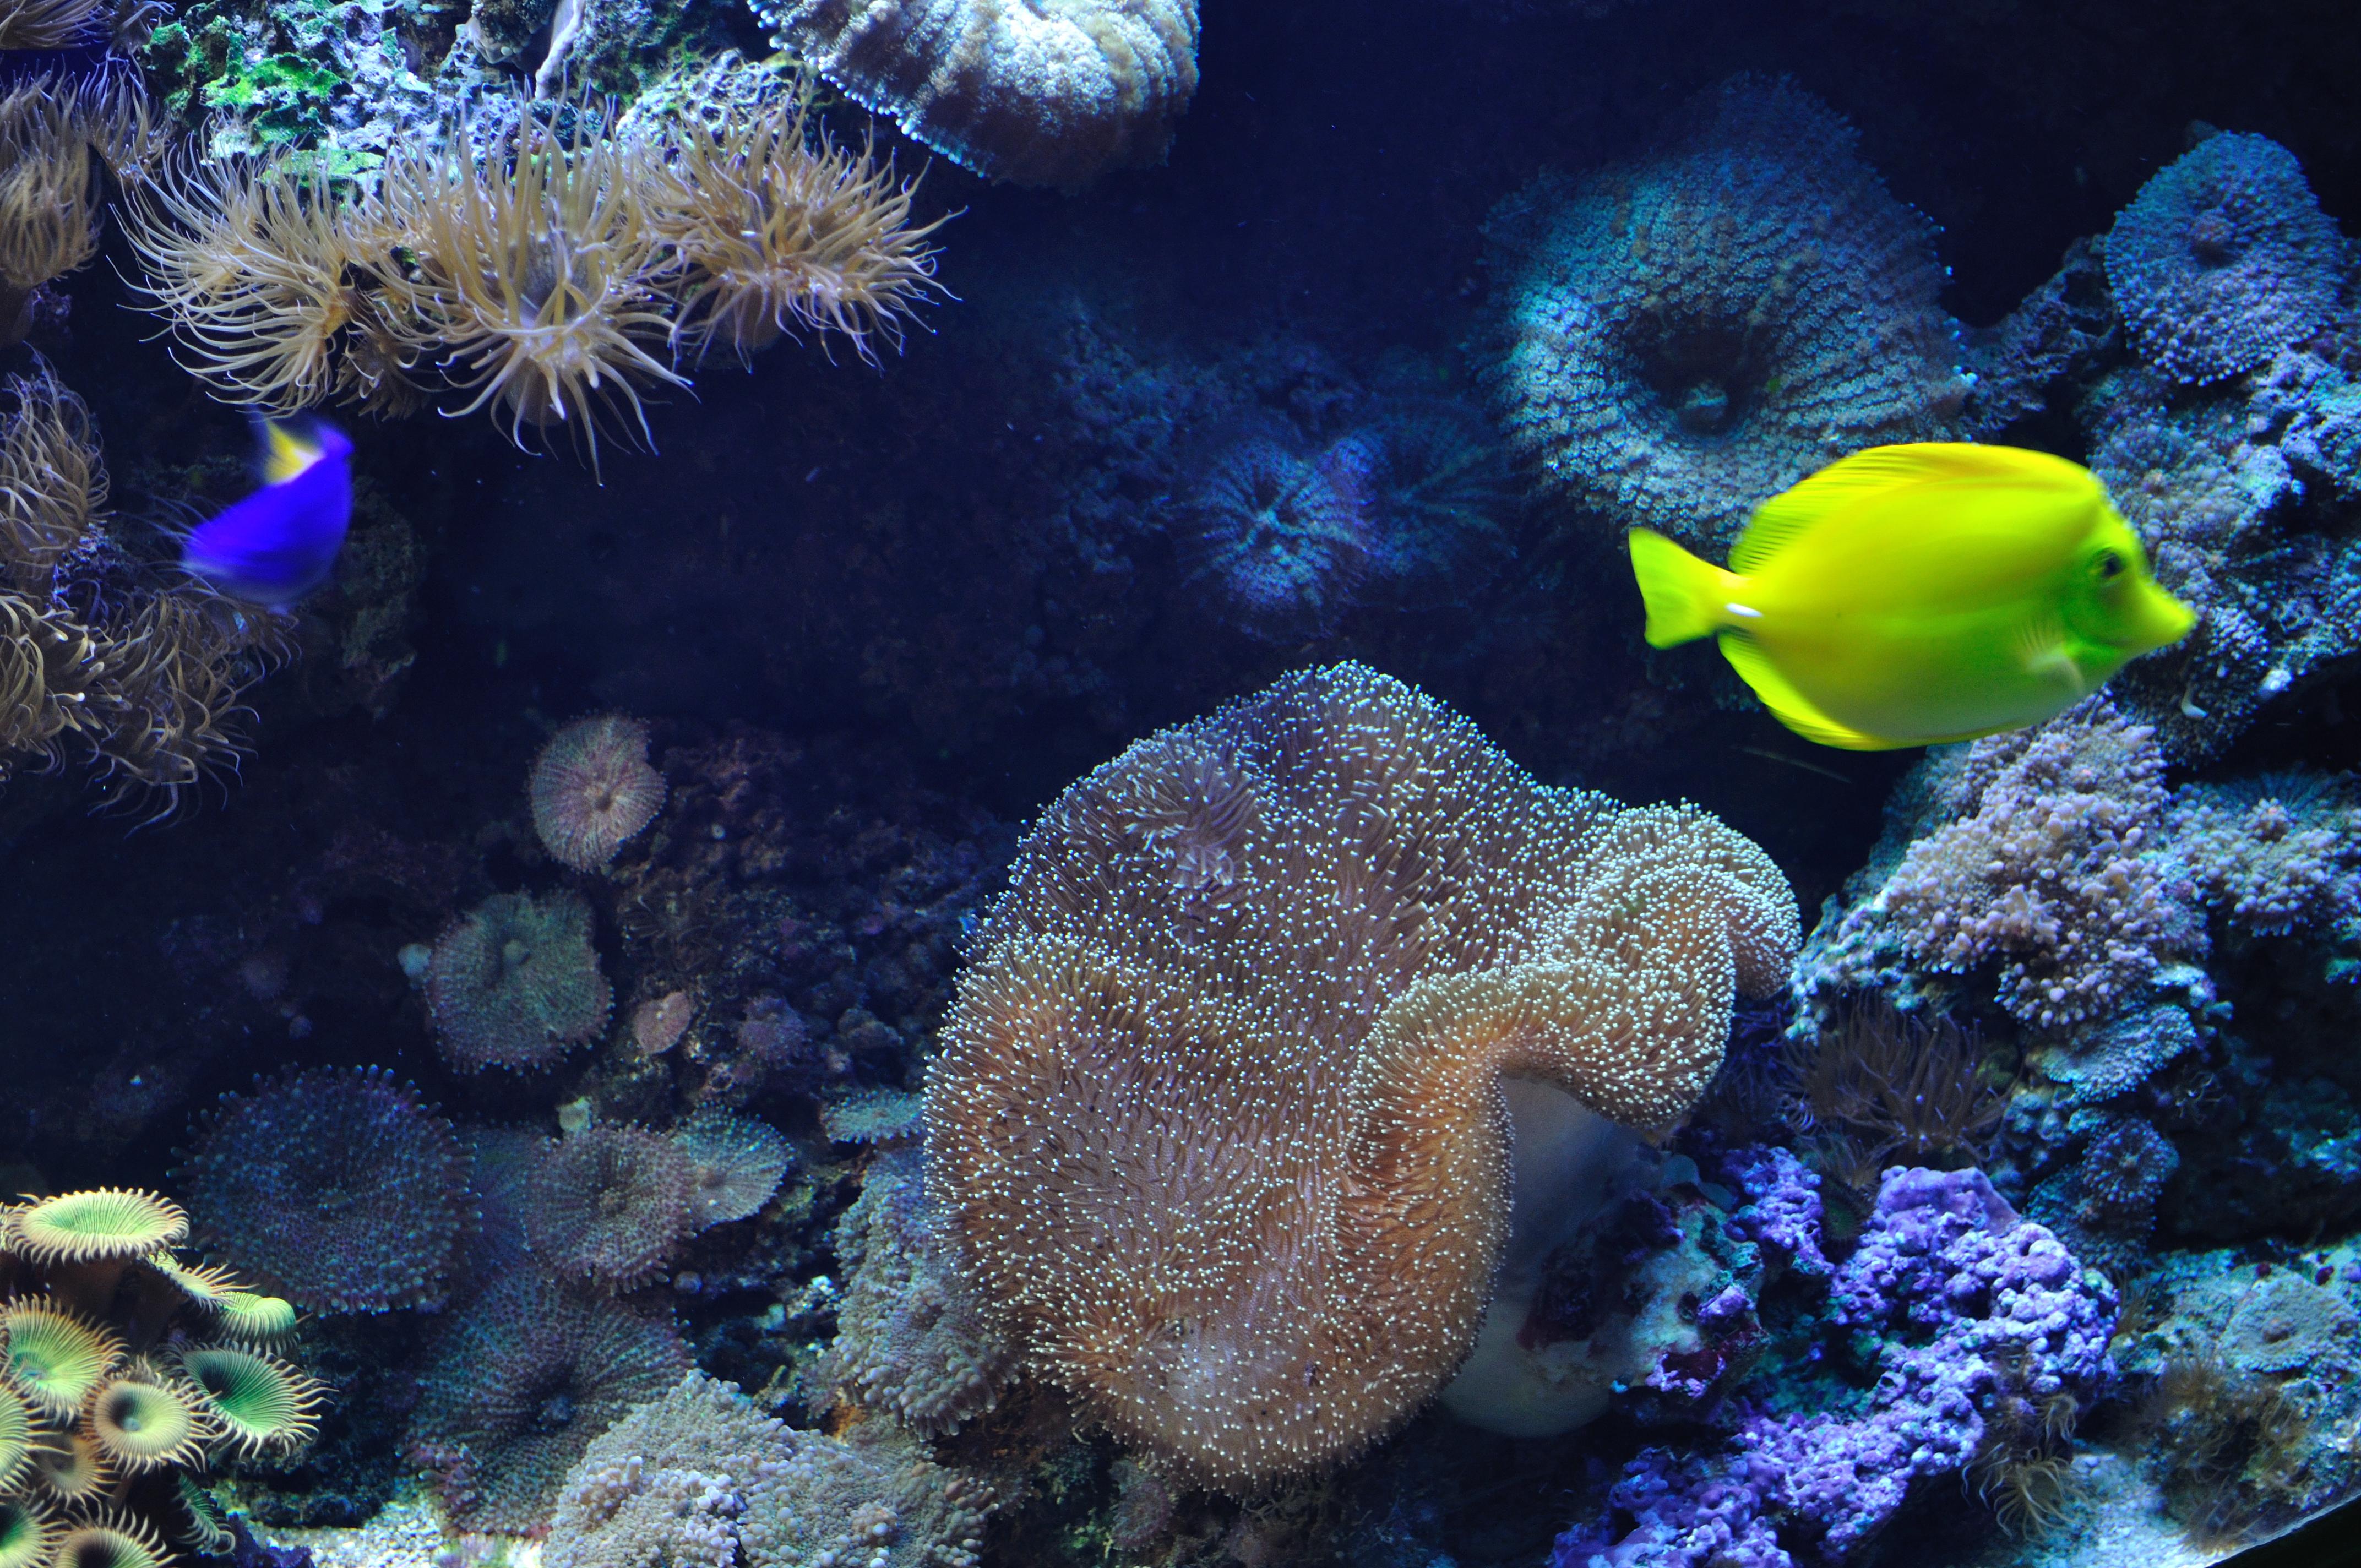 File:Marine fish & coral (5791779828).jpg - Wikimedia Commons